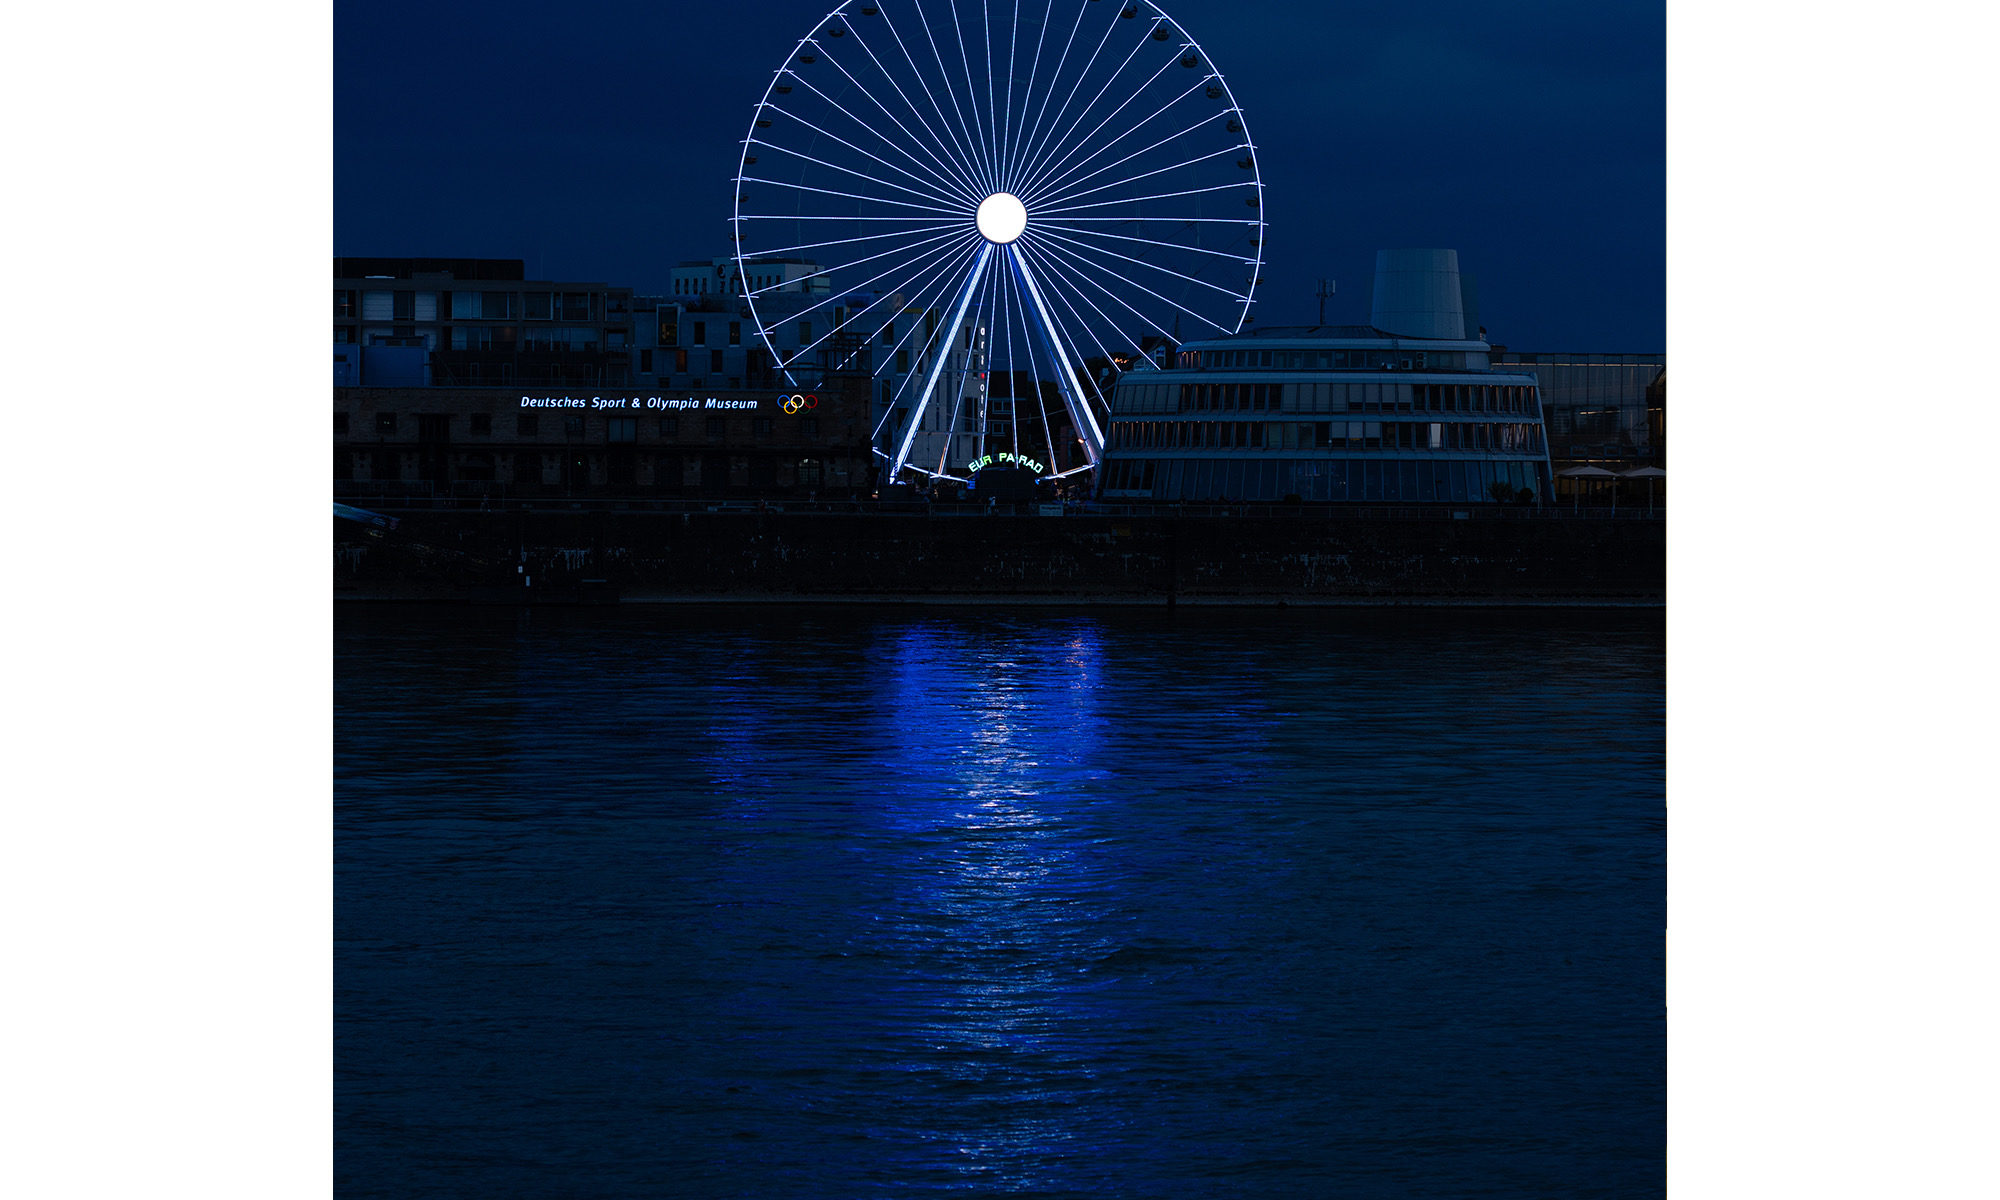 Riesenrad am Rhein in Köln